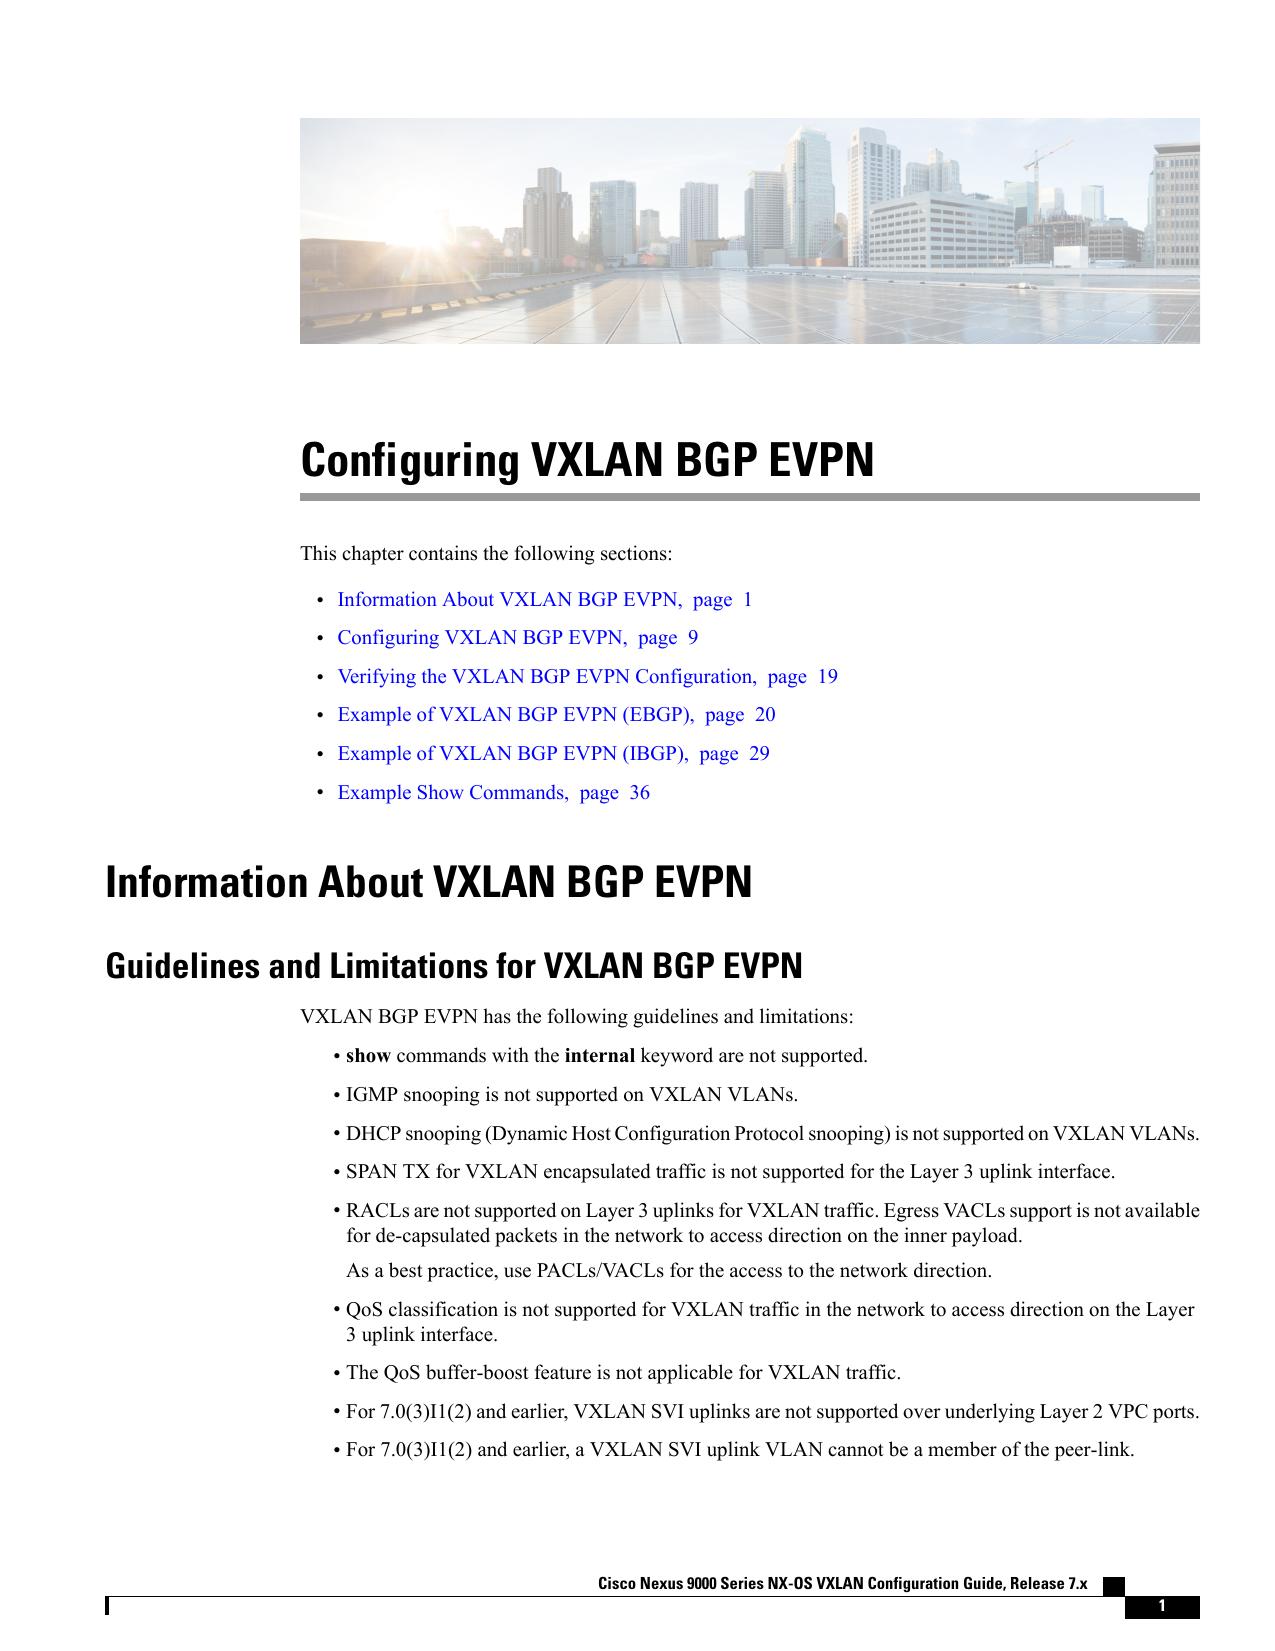 Configuring VXLAN BGP EVPN